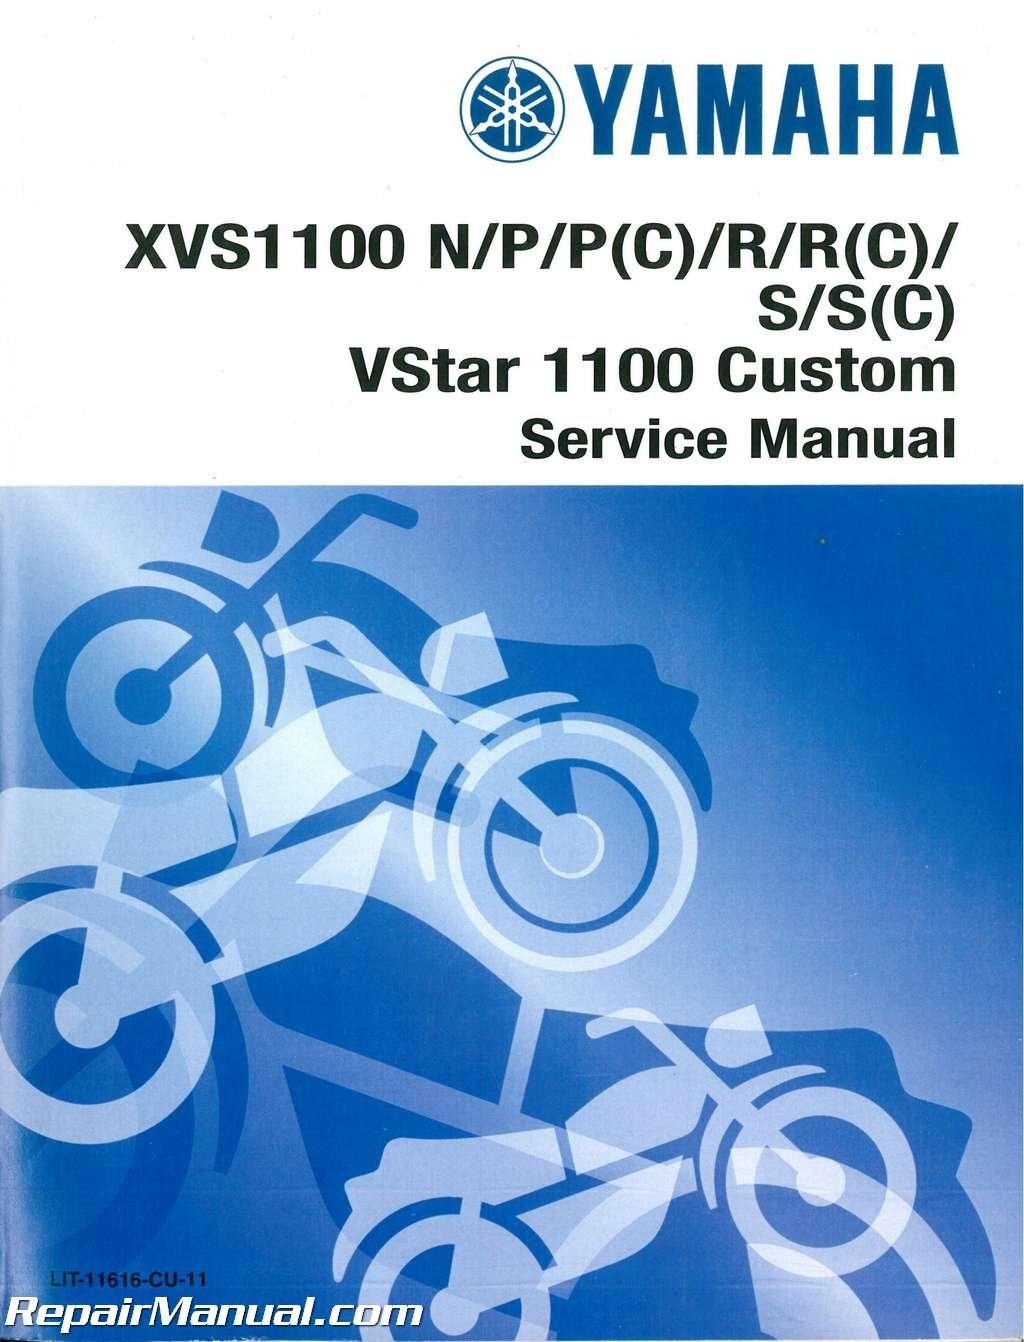 LIT-11616-CU-11 1999-2005 Yamaha XVS1100S SC V-Star Custom Service Manual:  Manufacturer: Amazon.com: Books